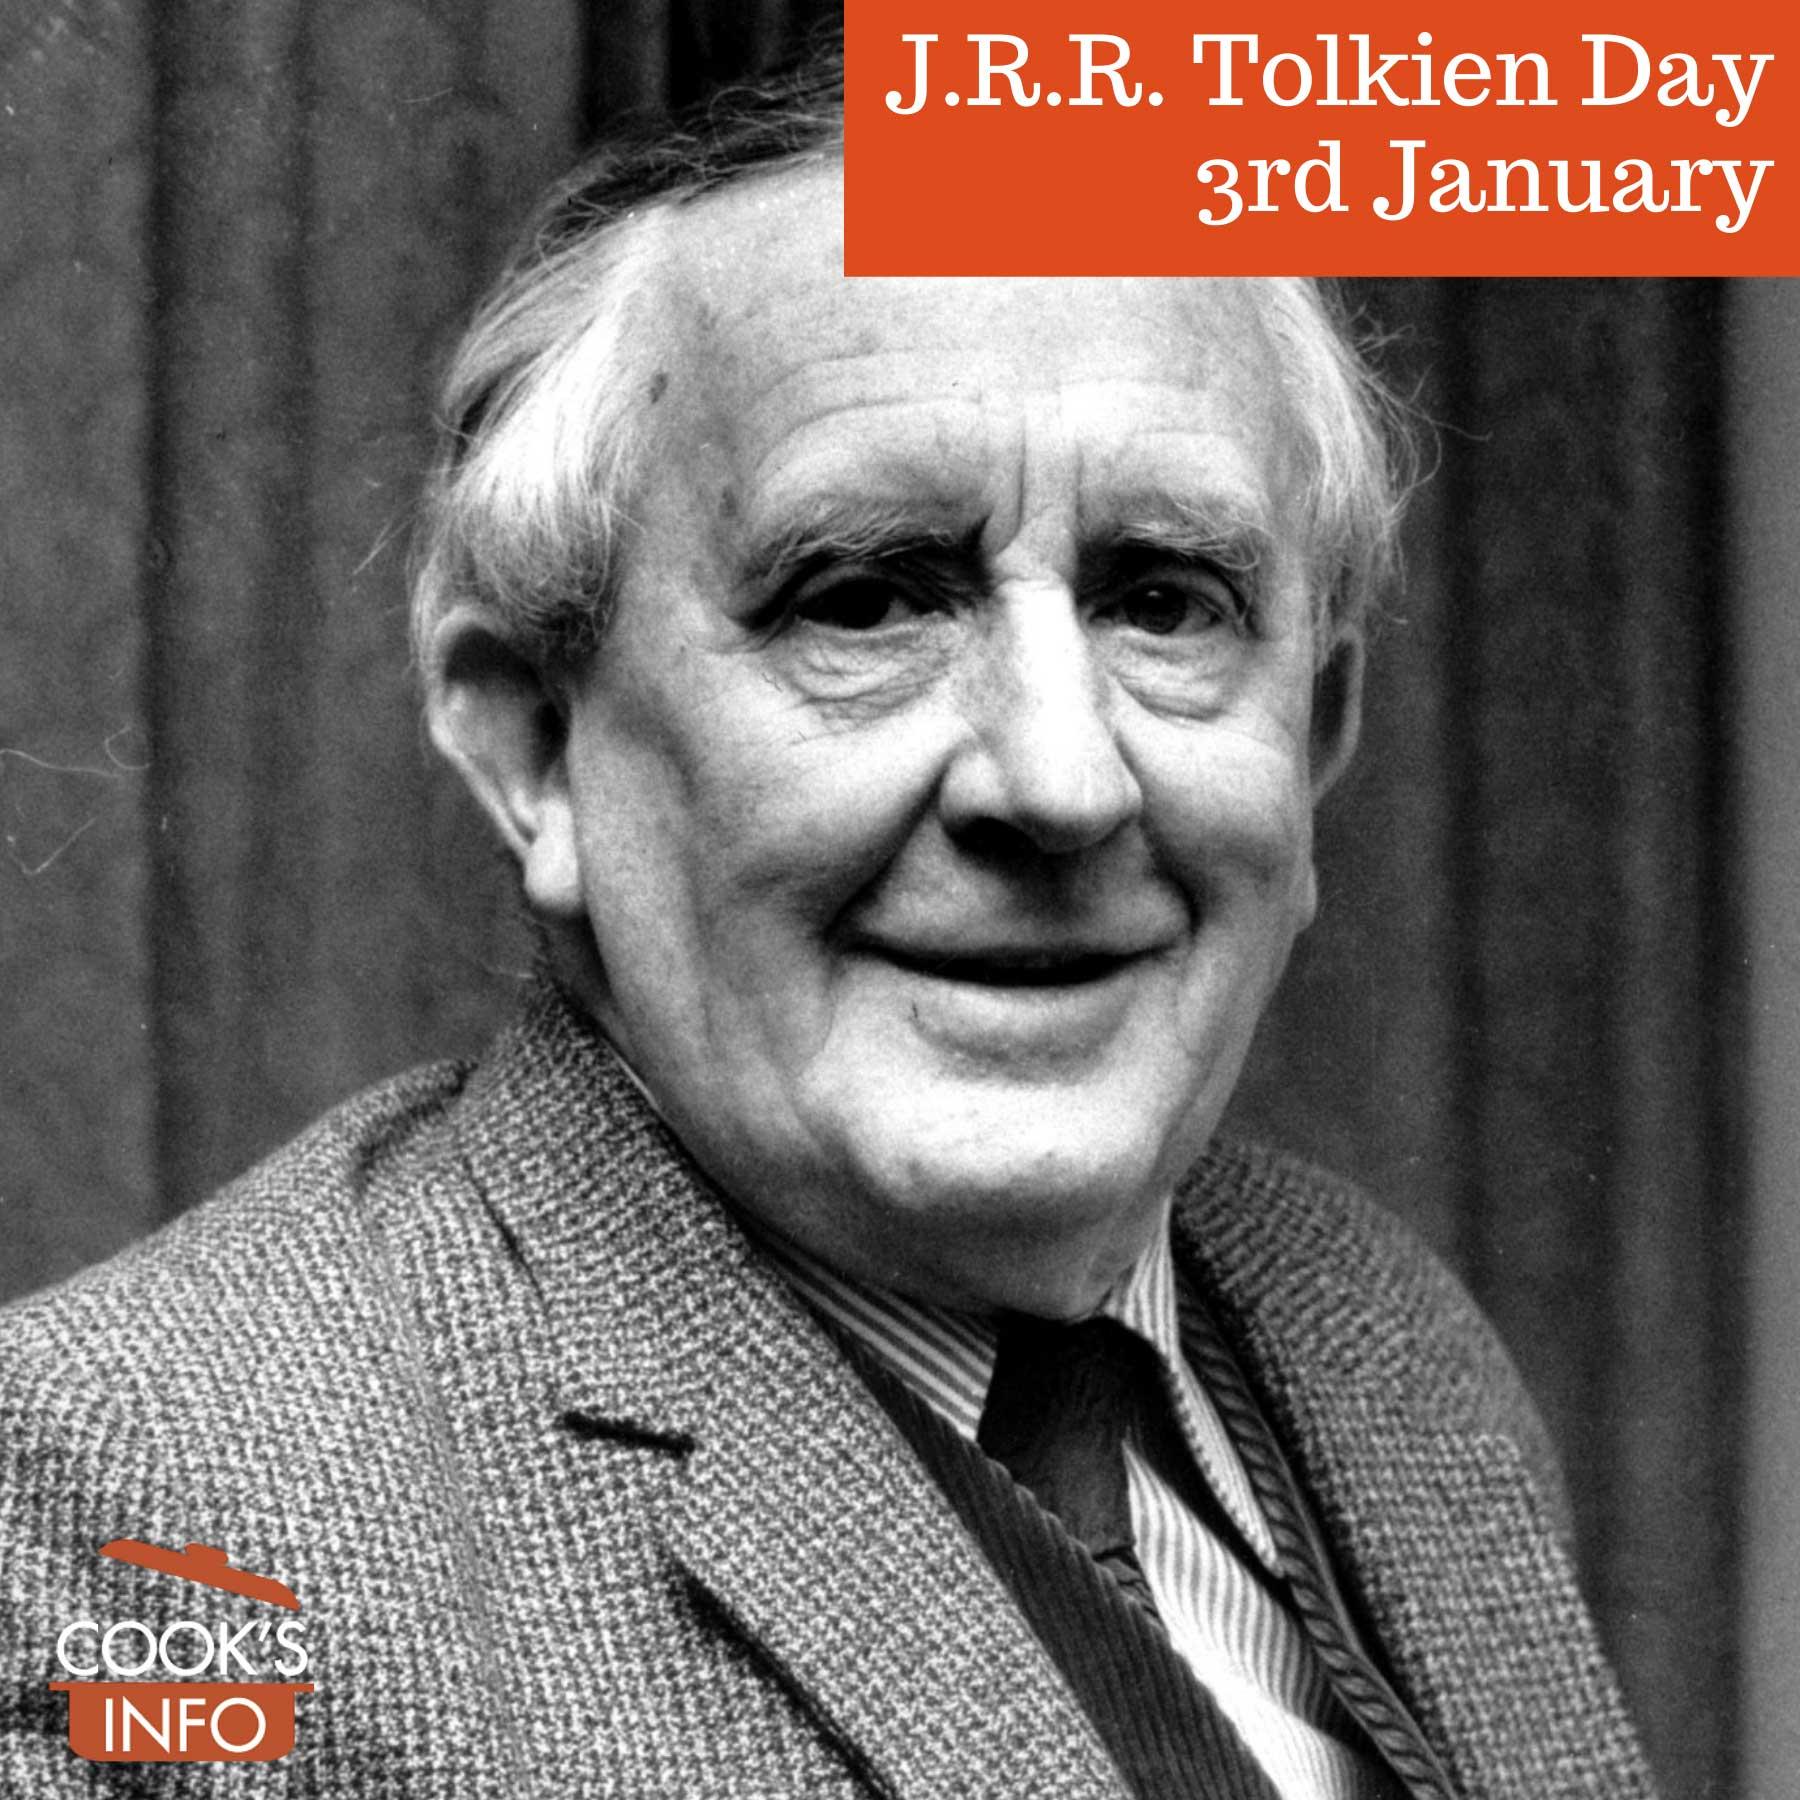 J.R.R. Tolkien in 1967